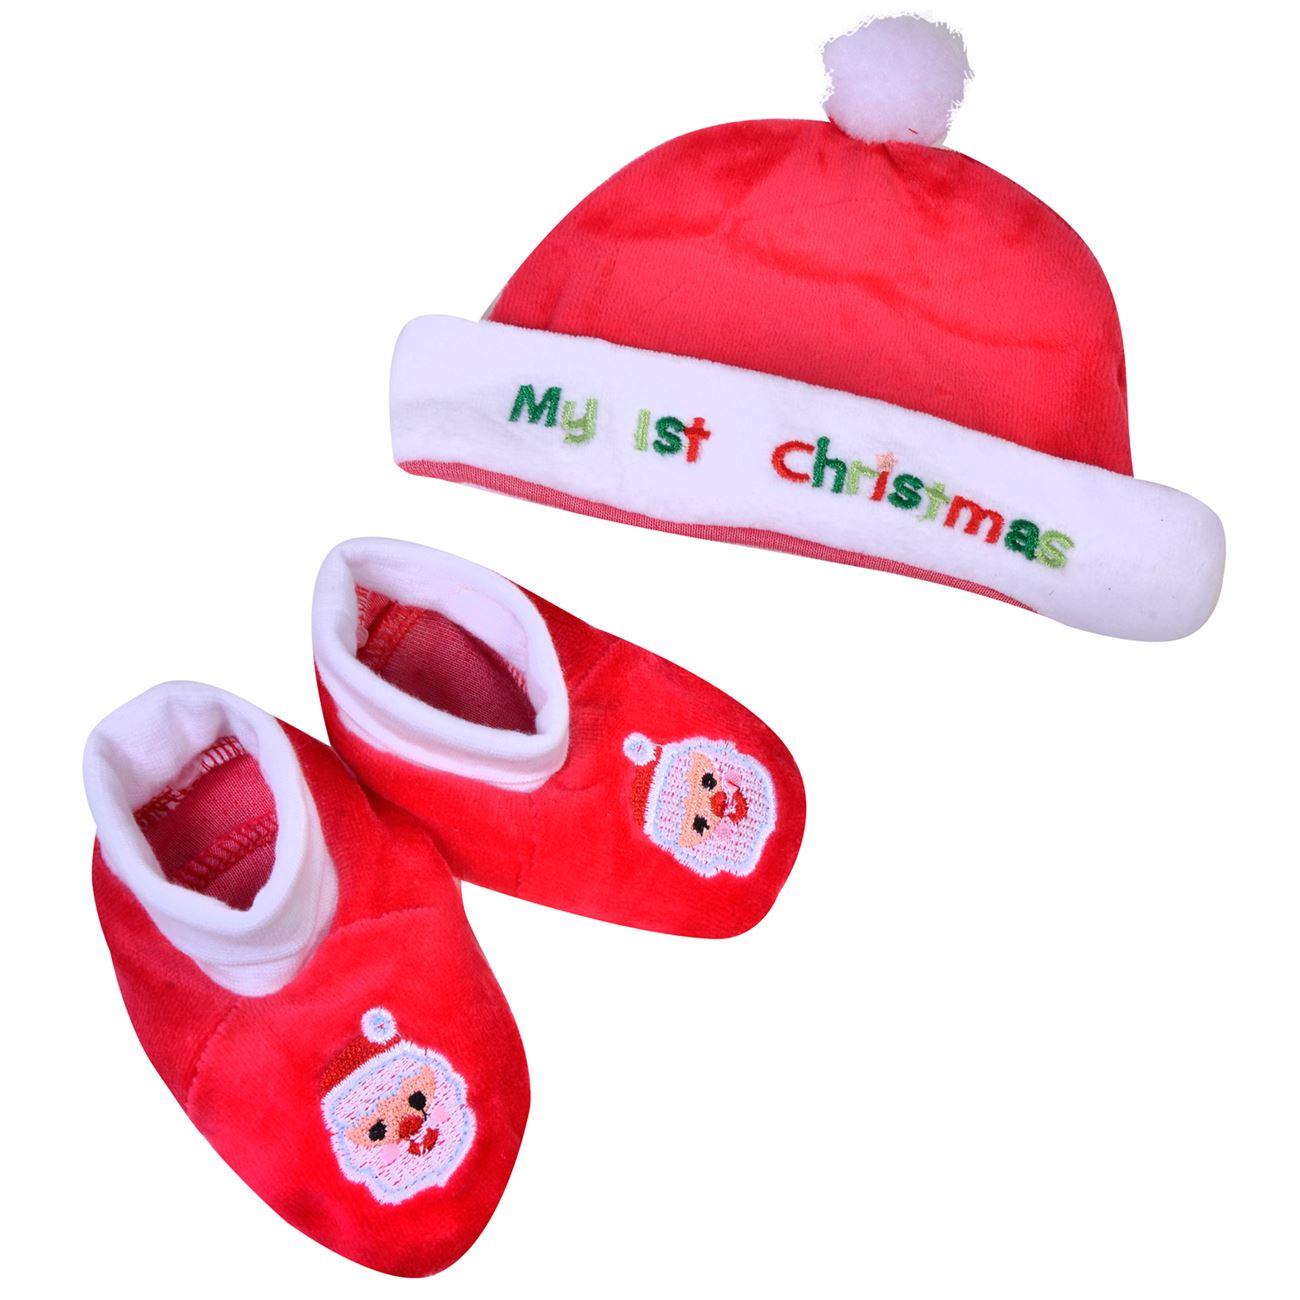 03c065dbd0c Χριστουγεννιάτικο Σκουφάκι & Παπουτσάκια < Χριστουγεννιάτικα Σκουφάκια Βebe  | Jumbo